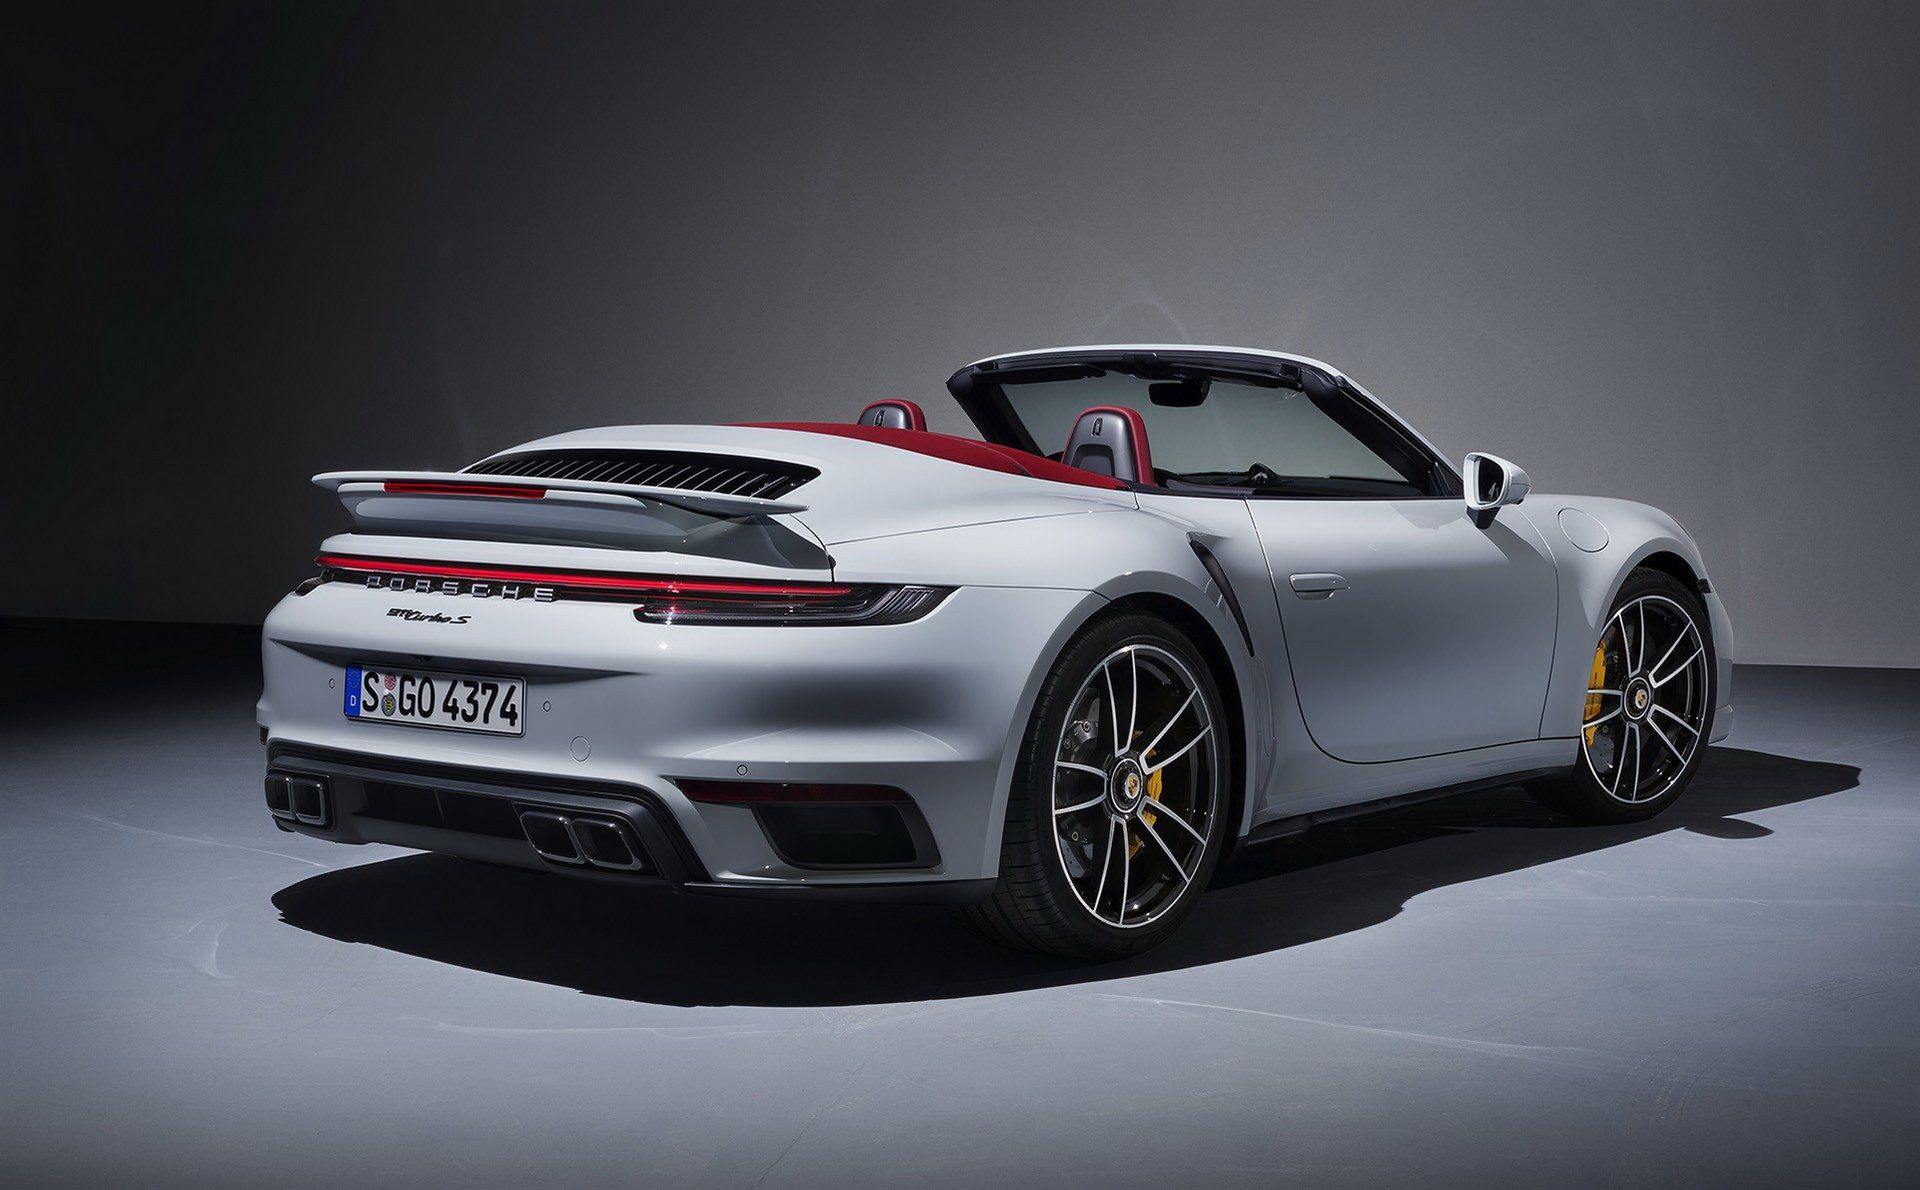 Porsche-911-Turbo-S-2020-45